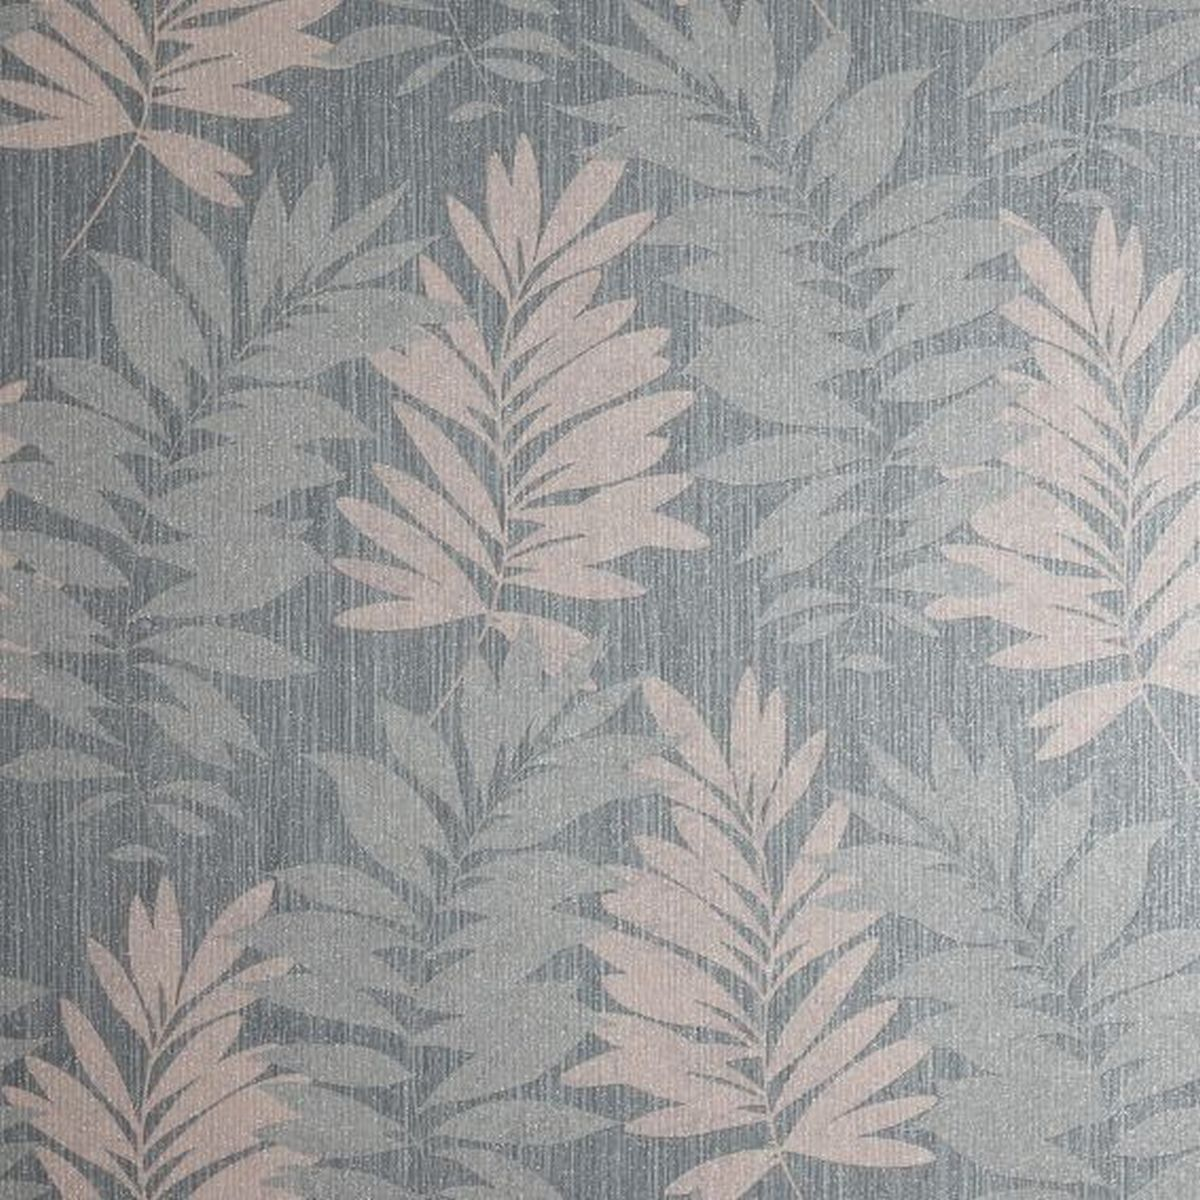 Best of Arthouse Vliestapete Erstklassige Wandbekleidung 296200 Grau Blumentapete